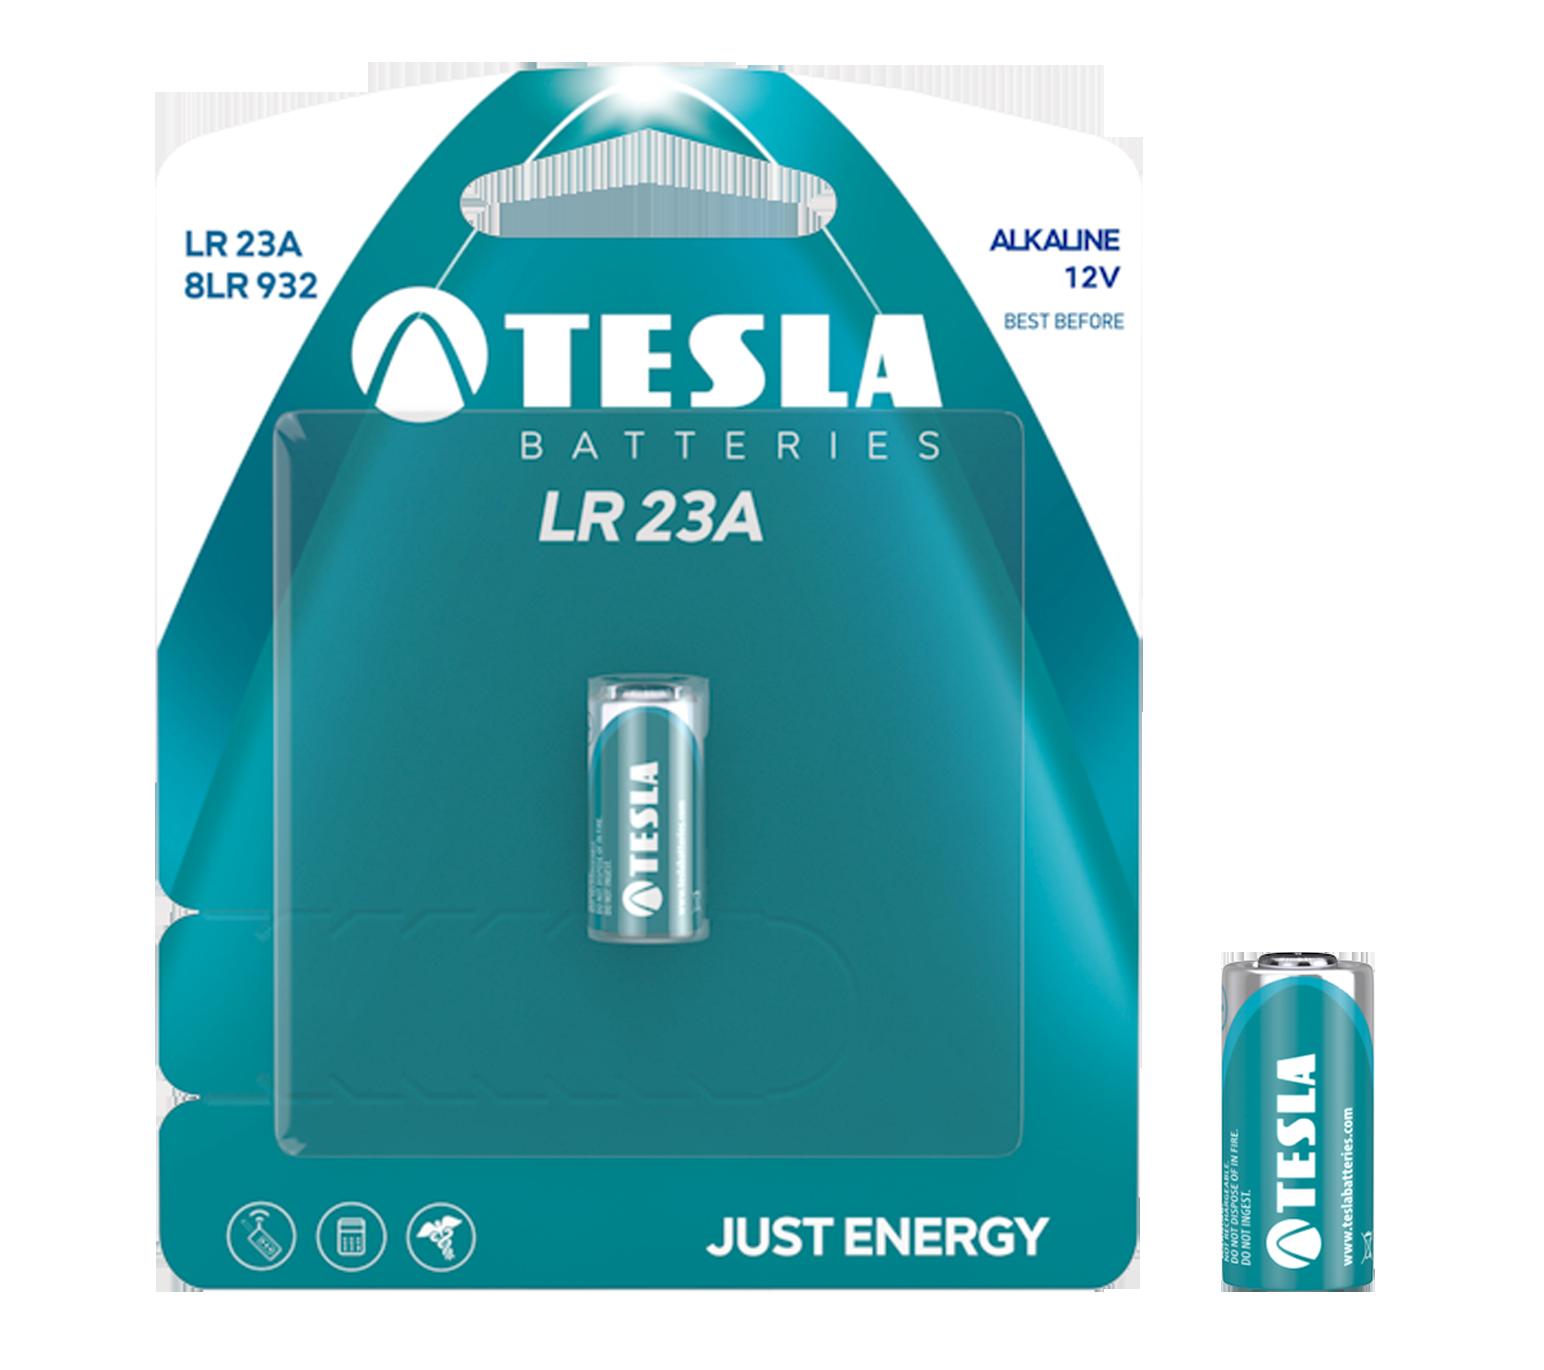 TESLA - baterie TESLA LR23A, 1ks, 8LR932